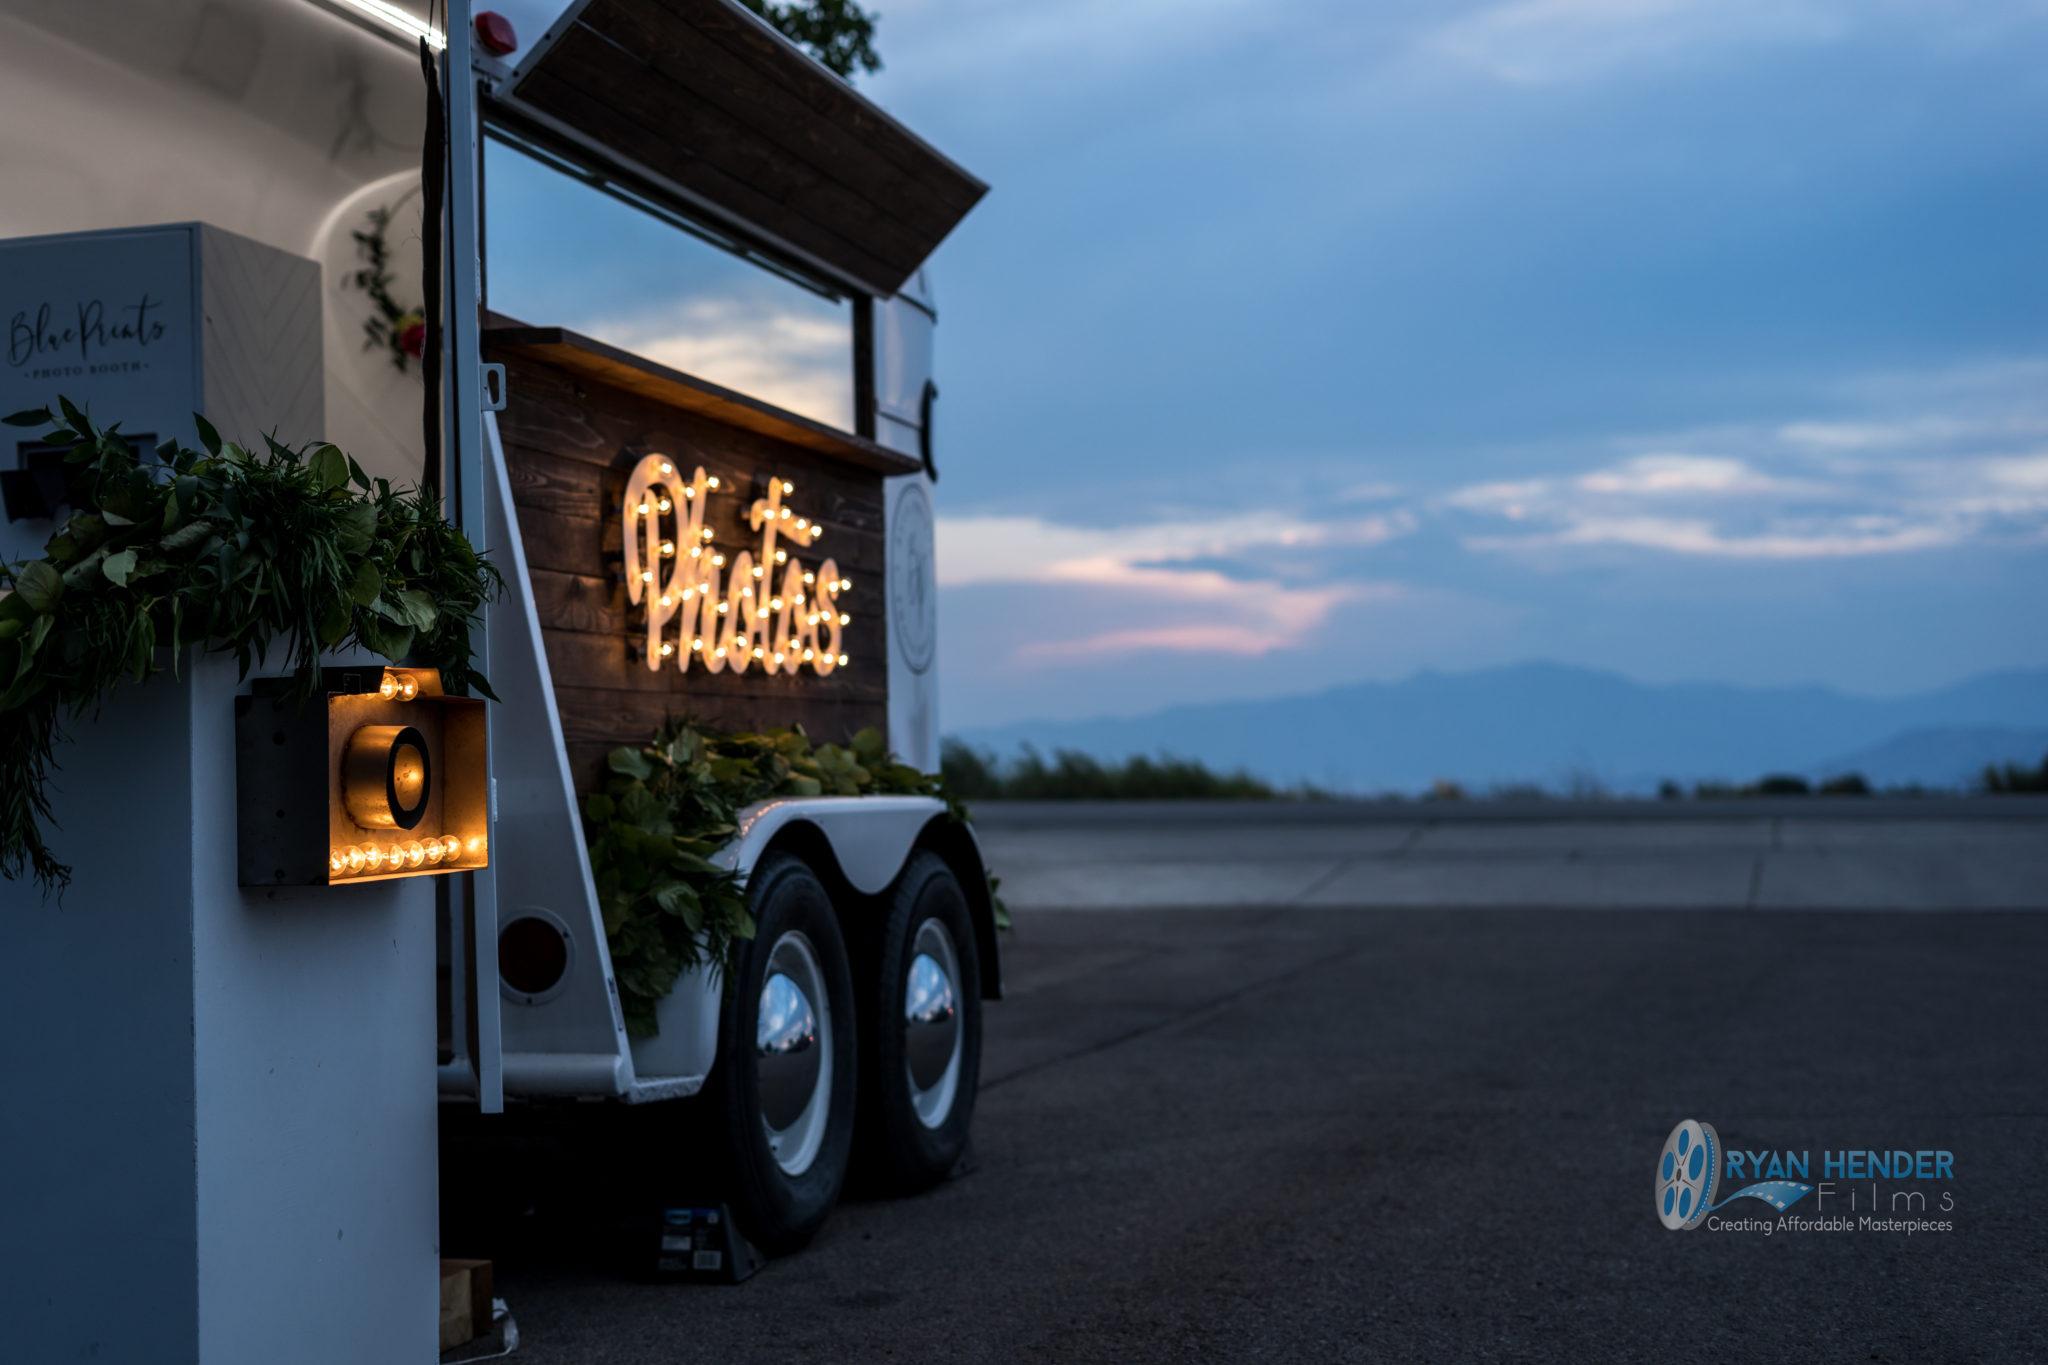 sunset photography horse trailer at wedding in utah